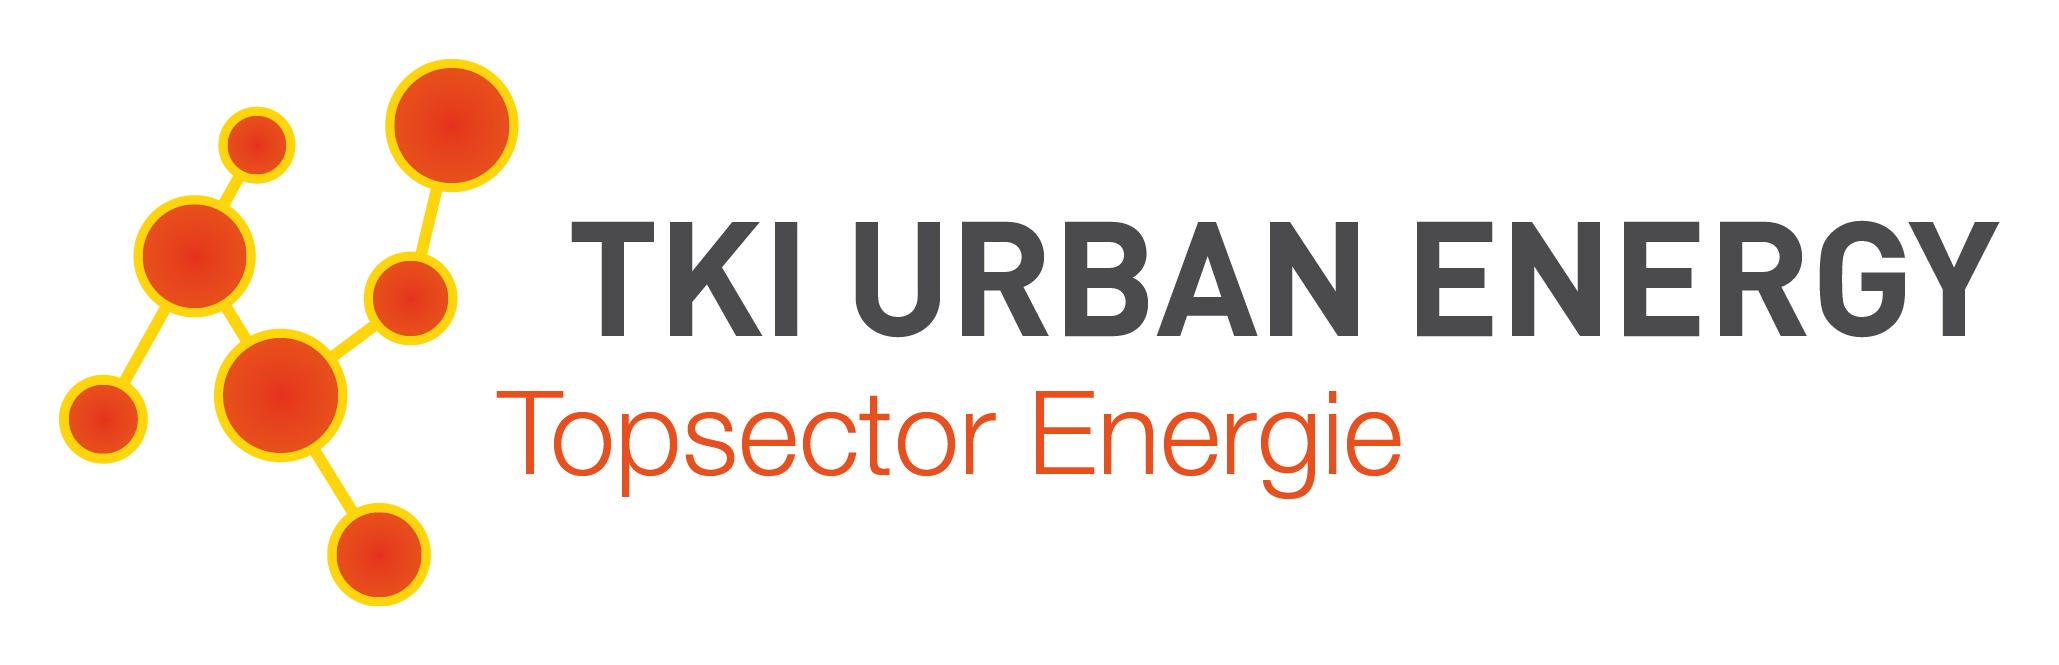 TSE Logo TKI Urban Energy.jpg